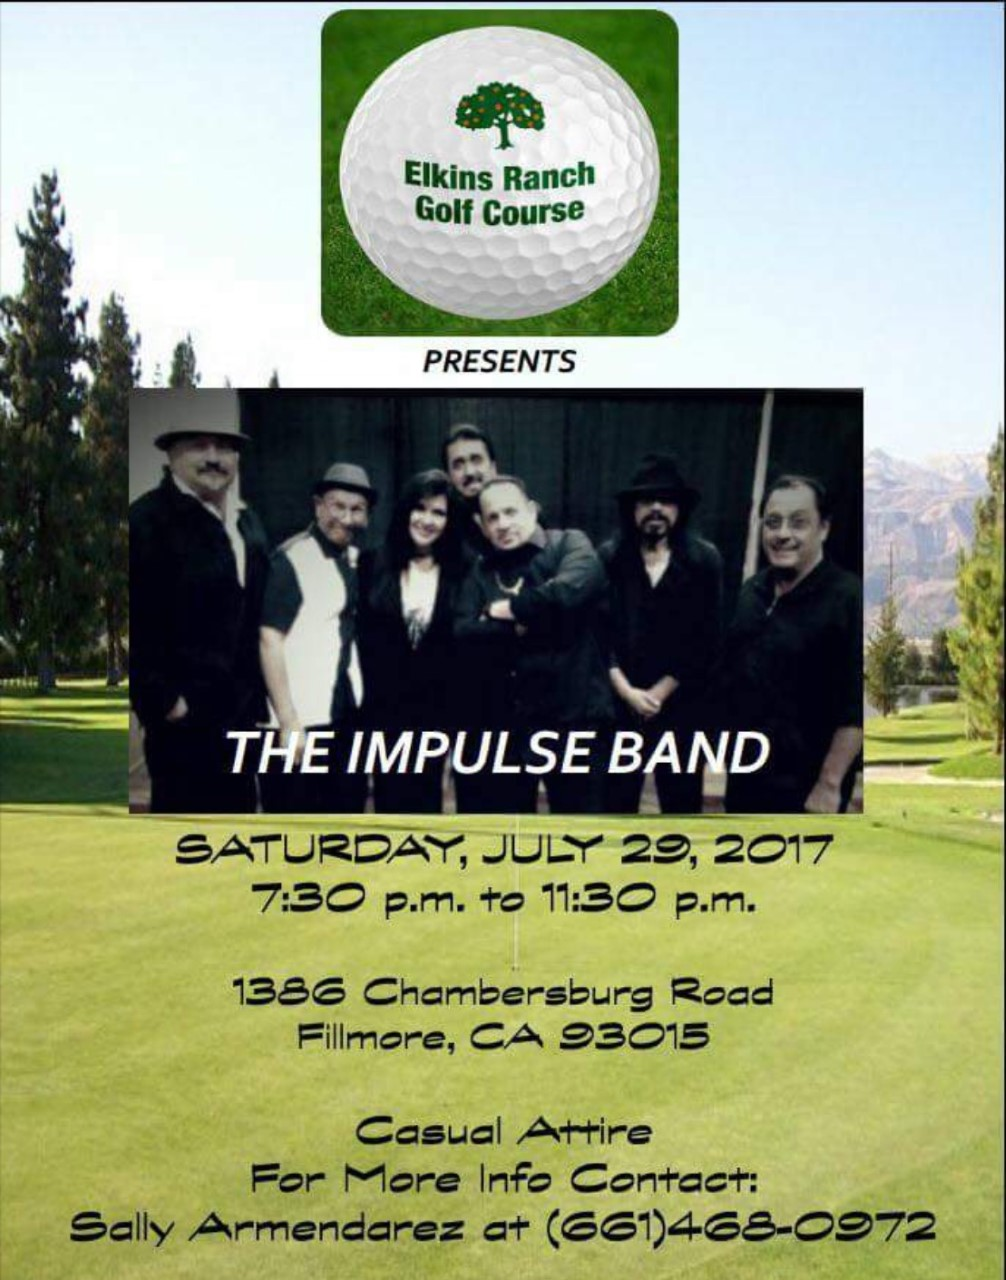 Event July 29, 2017 The Impulse Band.jpg